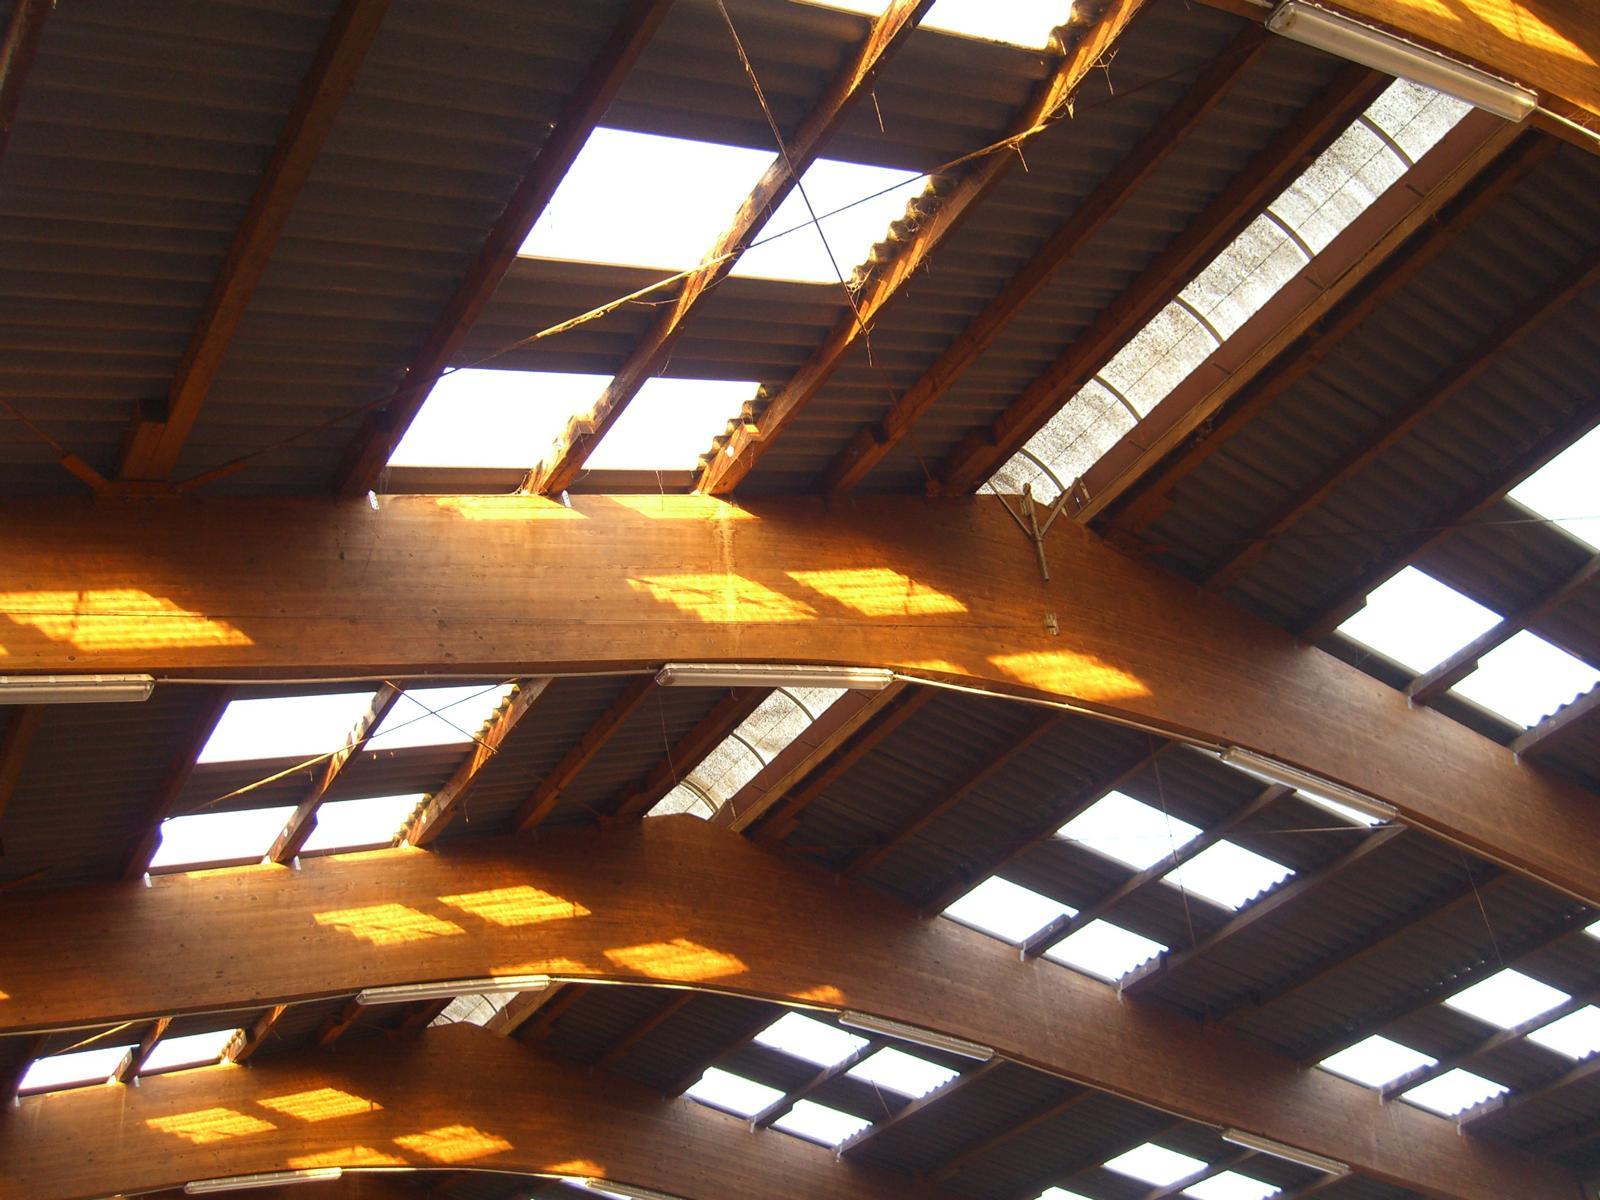 Holzarbeiten Reithalle Ullersdorf